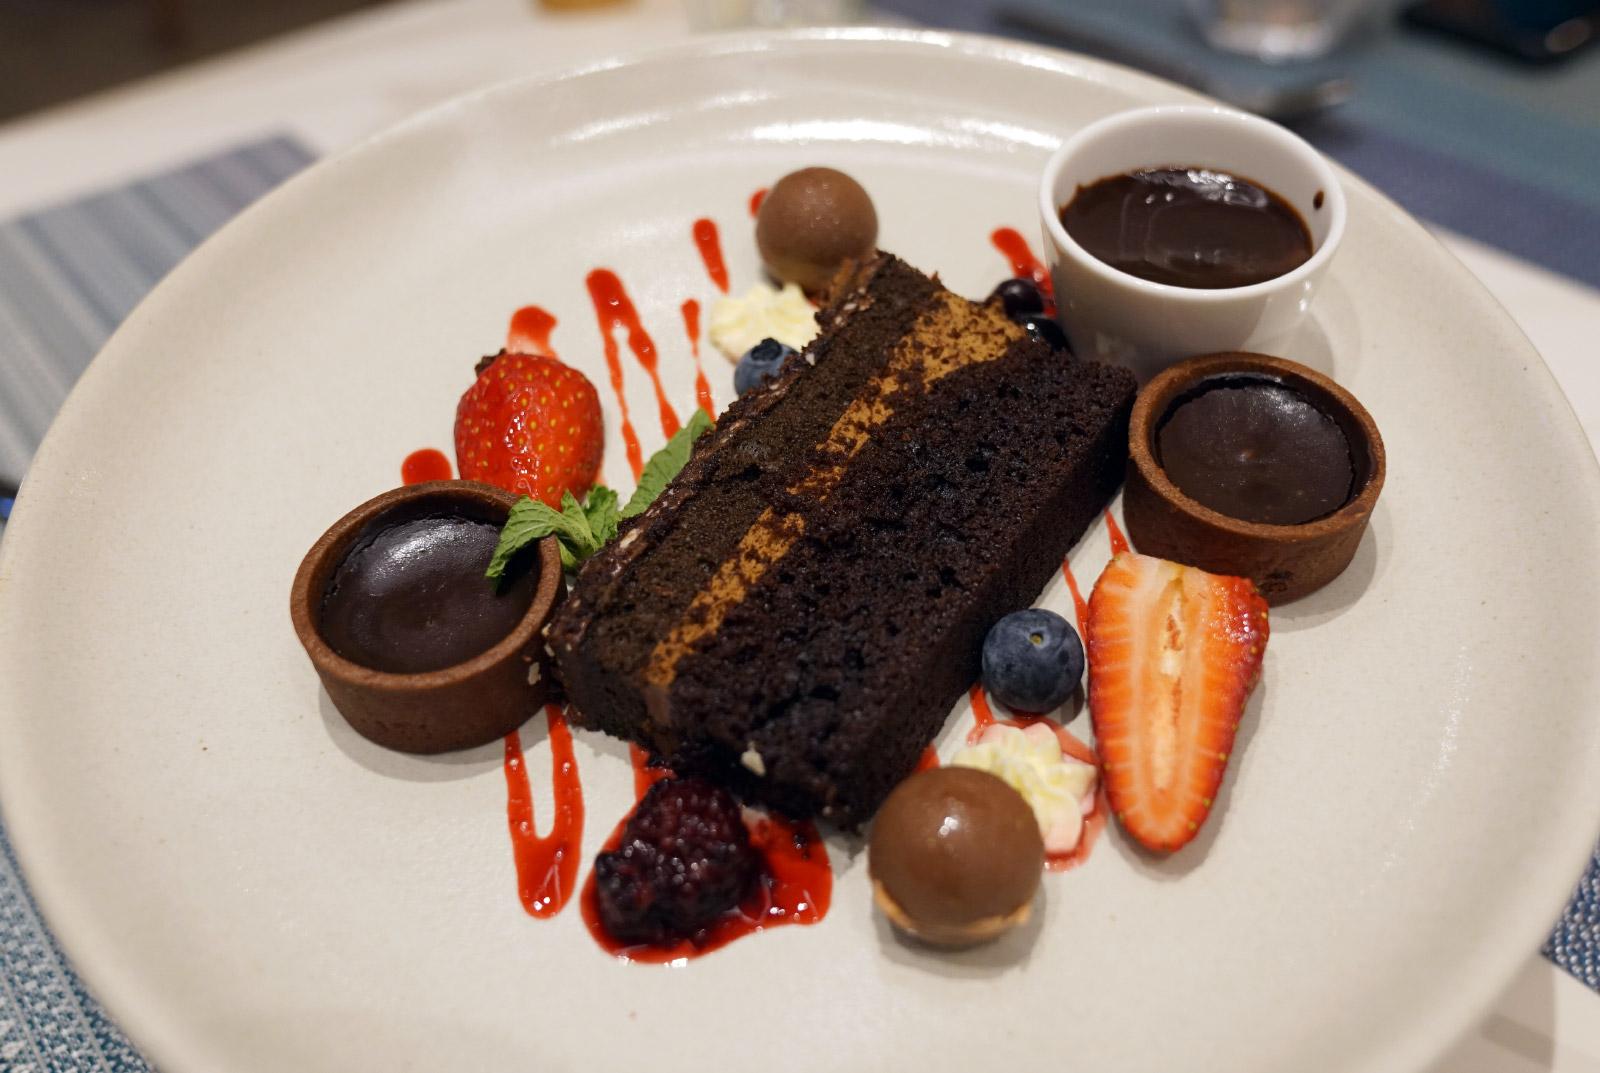 Chocolate Chocolate Chocolate Chocolate Chocolate